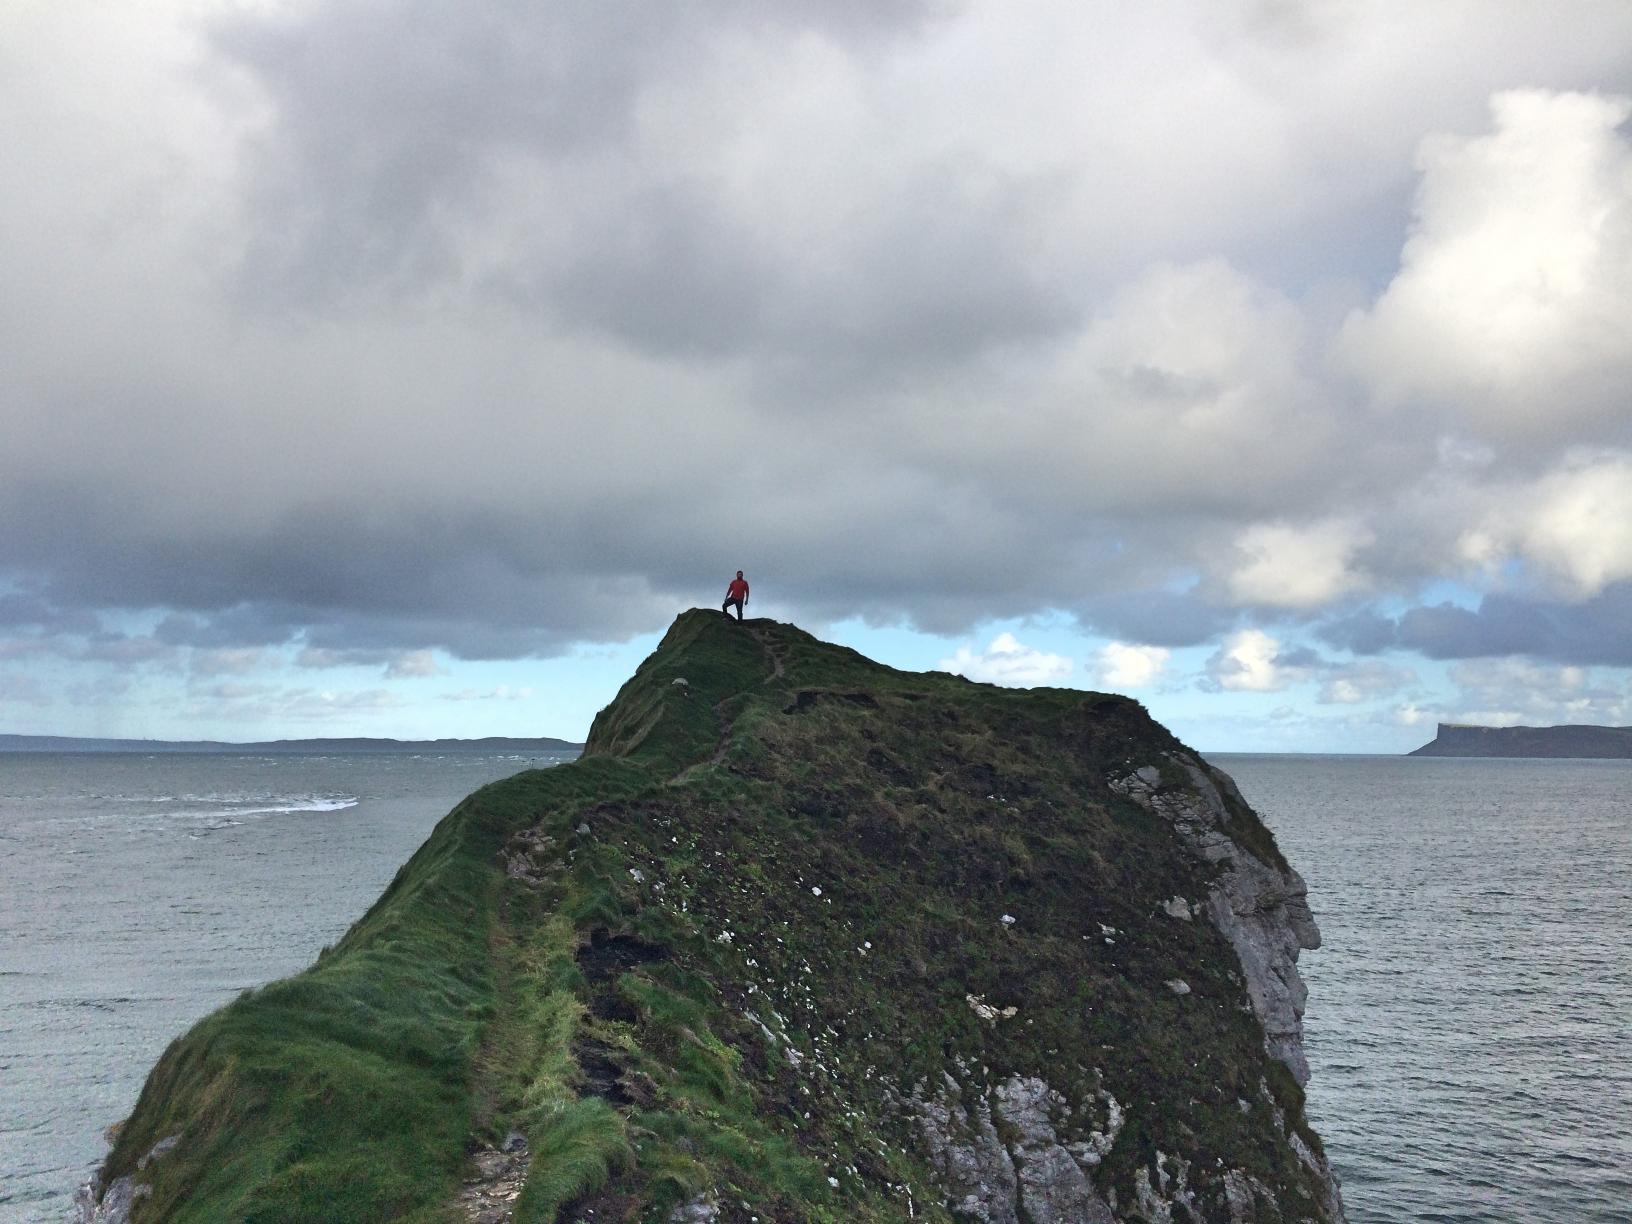 kinbane_head_castle_ni_explorer_northern_ireland (11).jpg